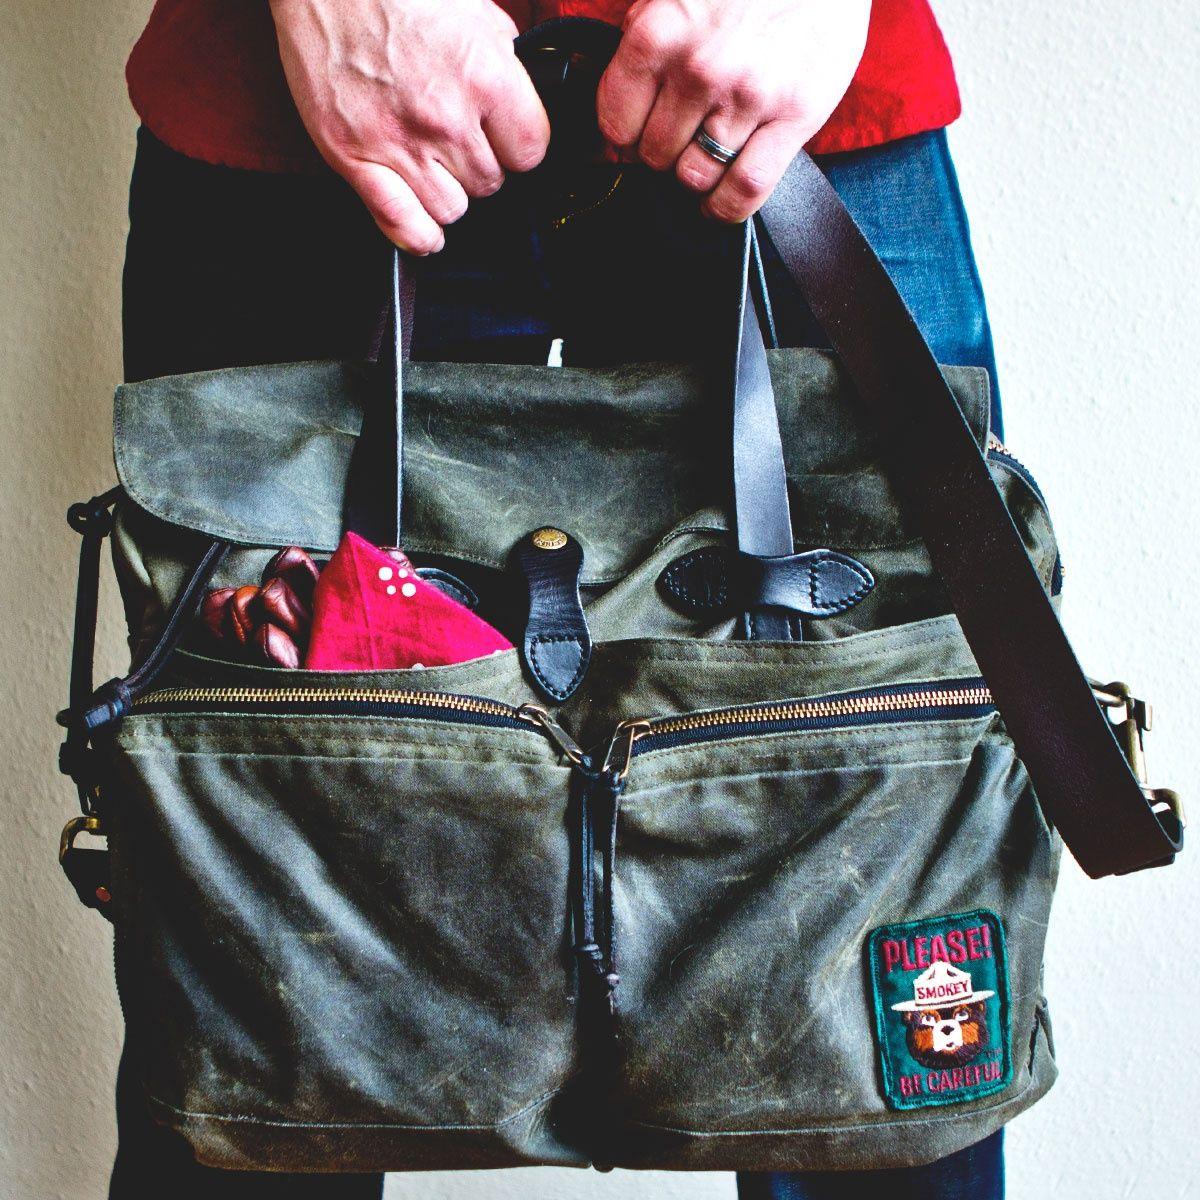 140 Filson 24 Hour Tin Briefcase Filson Bags Filson Leather Filson Briefcase